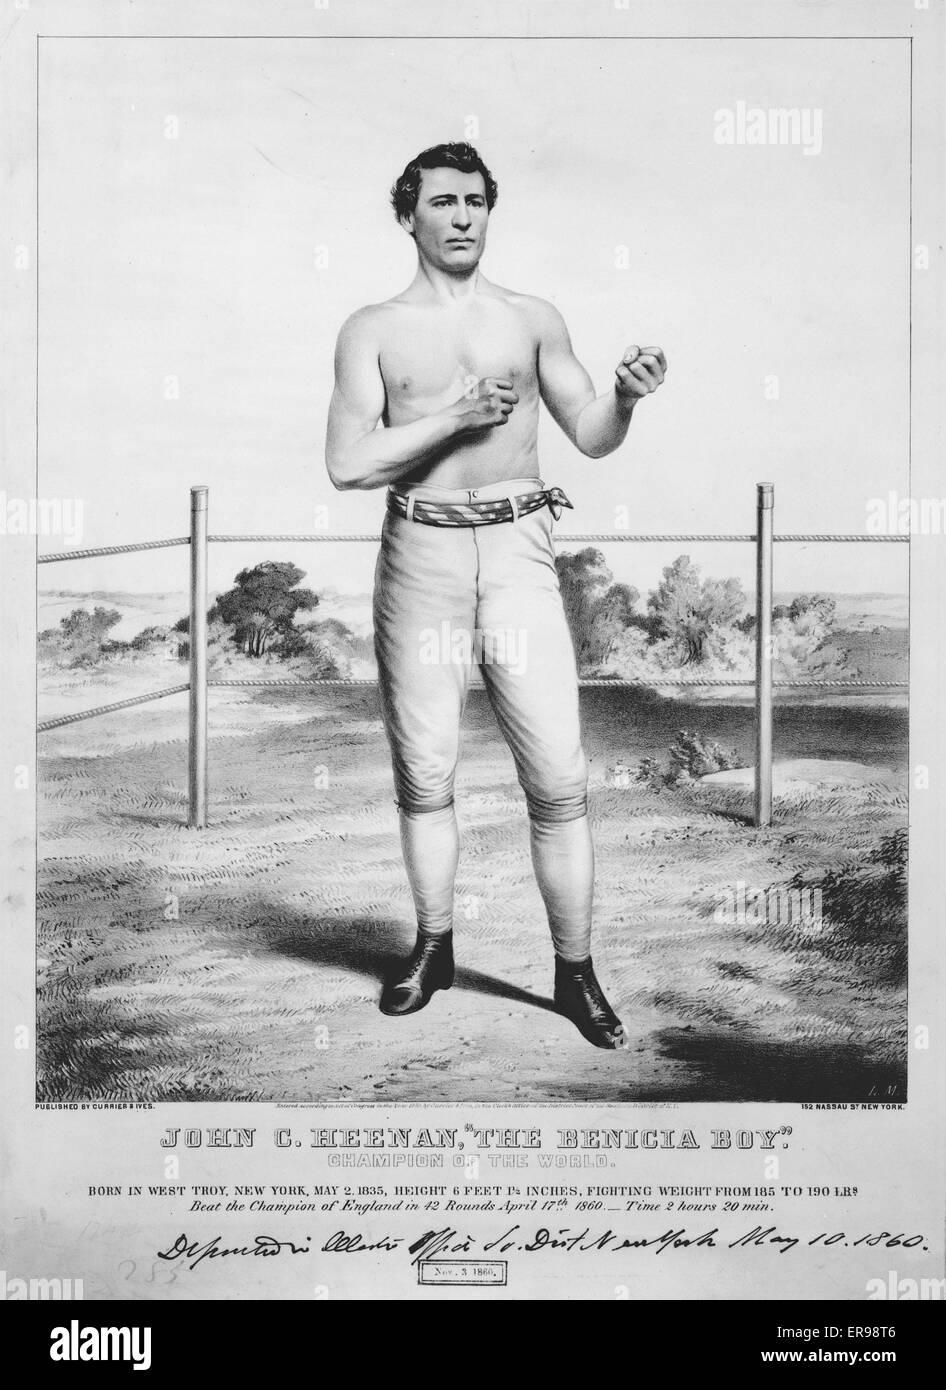 John C. Heenan, The Benicia Boy - champion of the world. John C. Heenan, full-length portrait, facing slightly right, - Stock Image